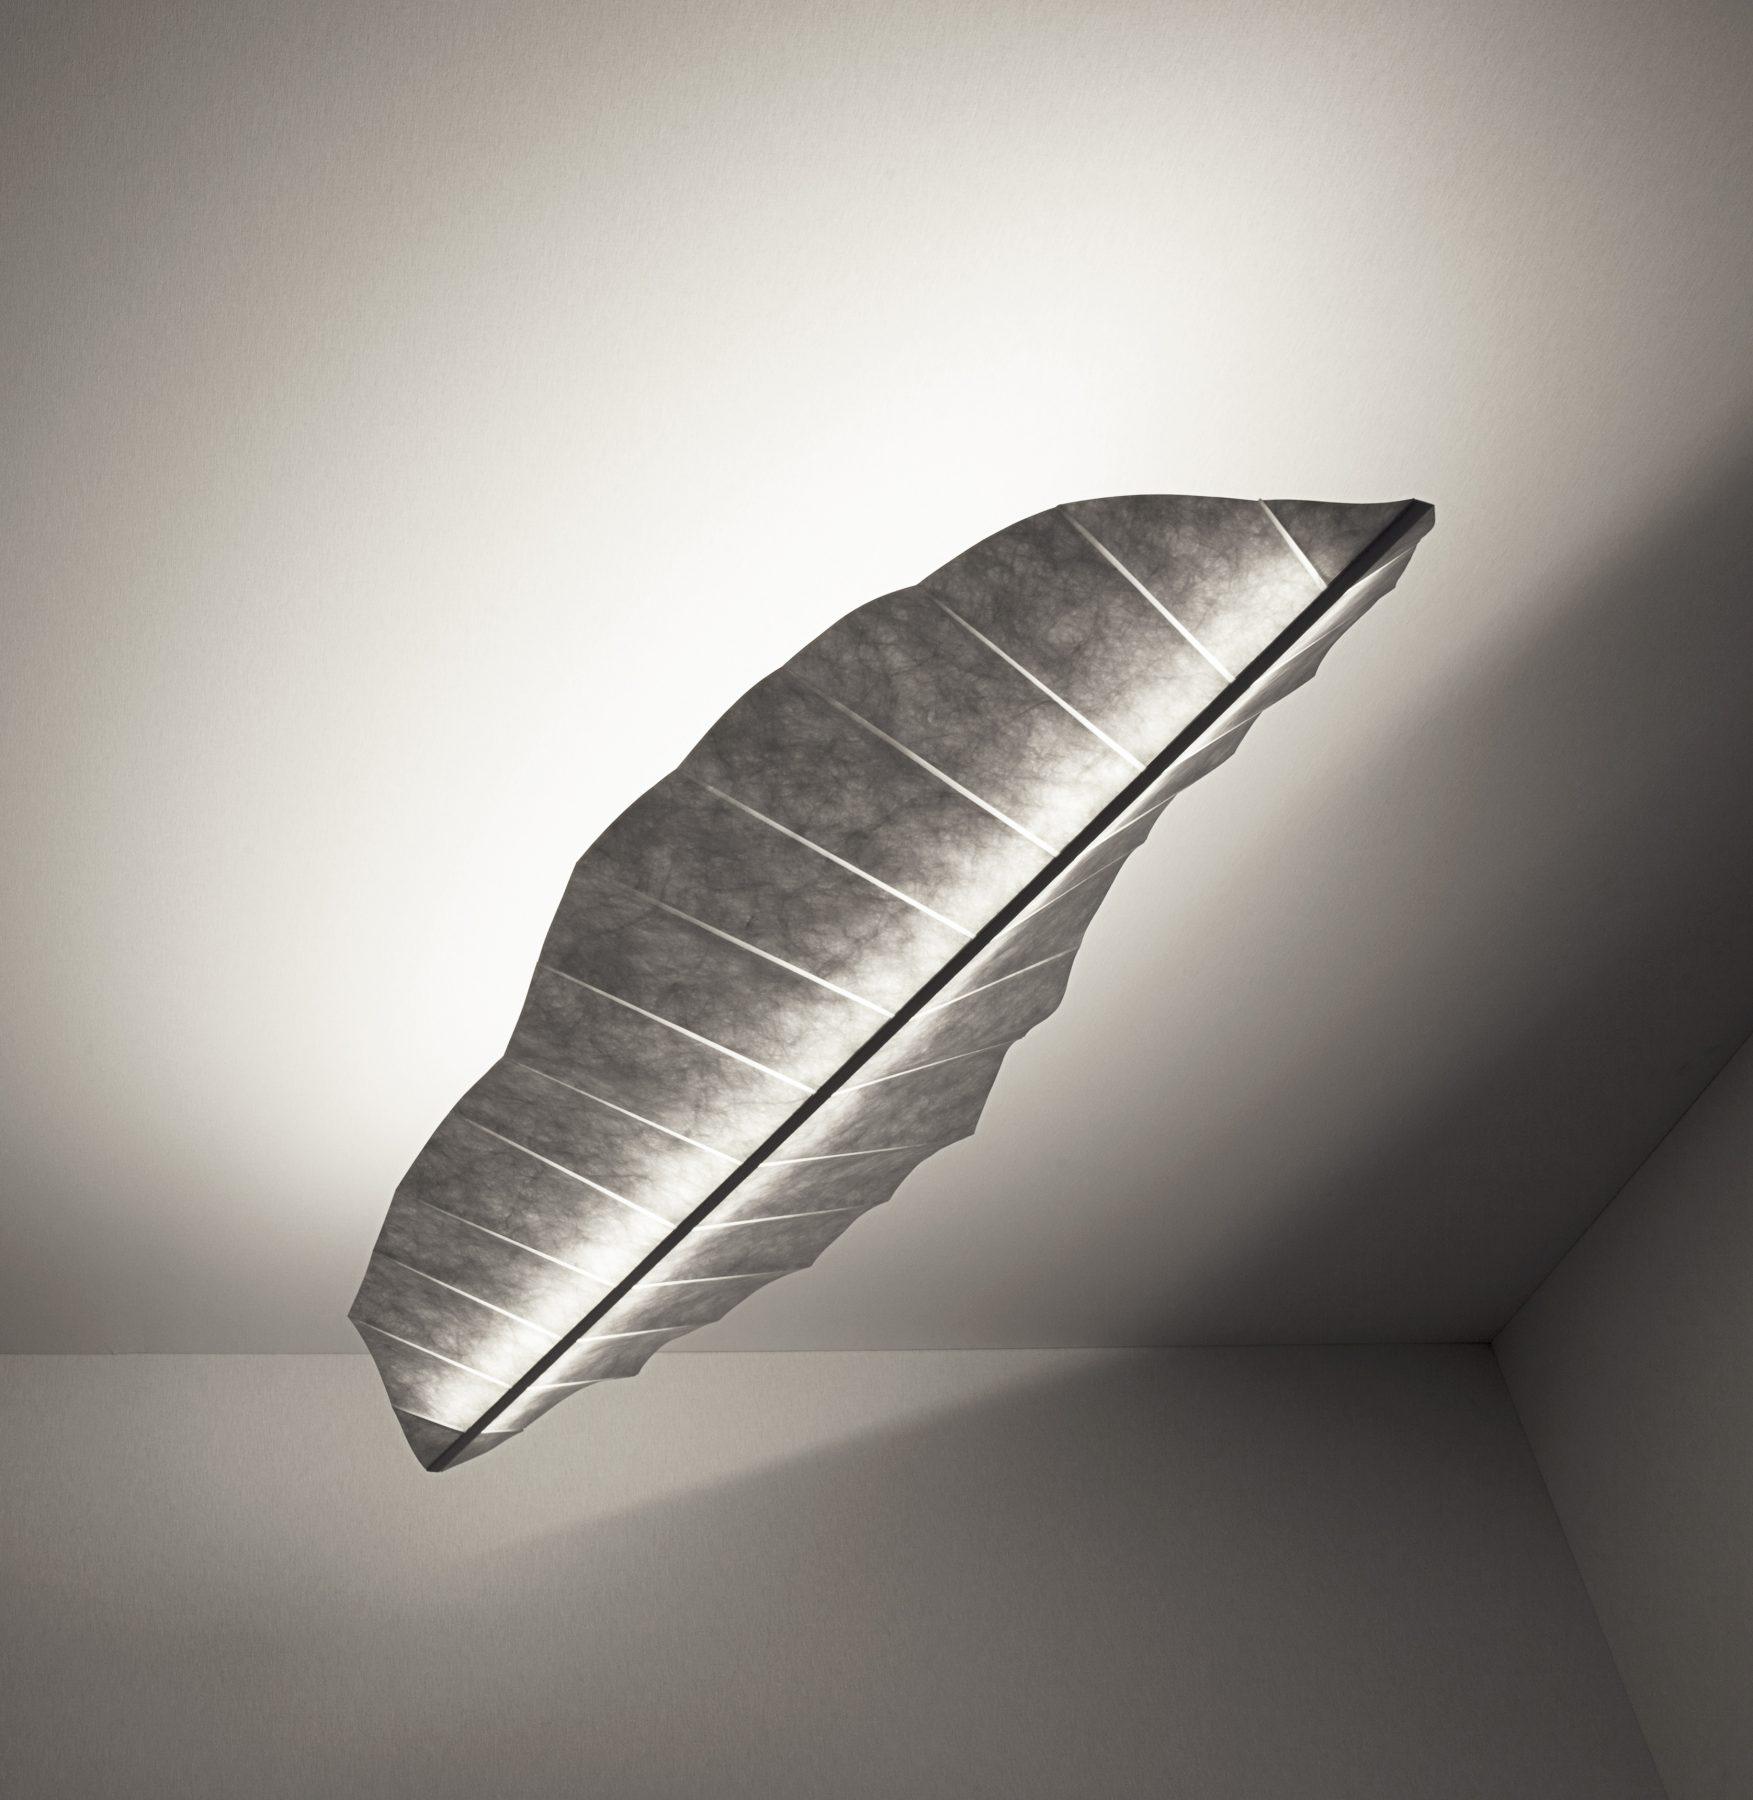 PLUME light - Aide à projet VIA 2013 - design by bold - photo Marie Flores - www.bold-design.fr